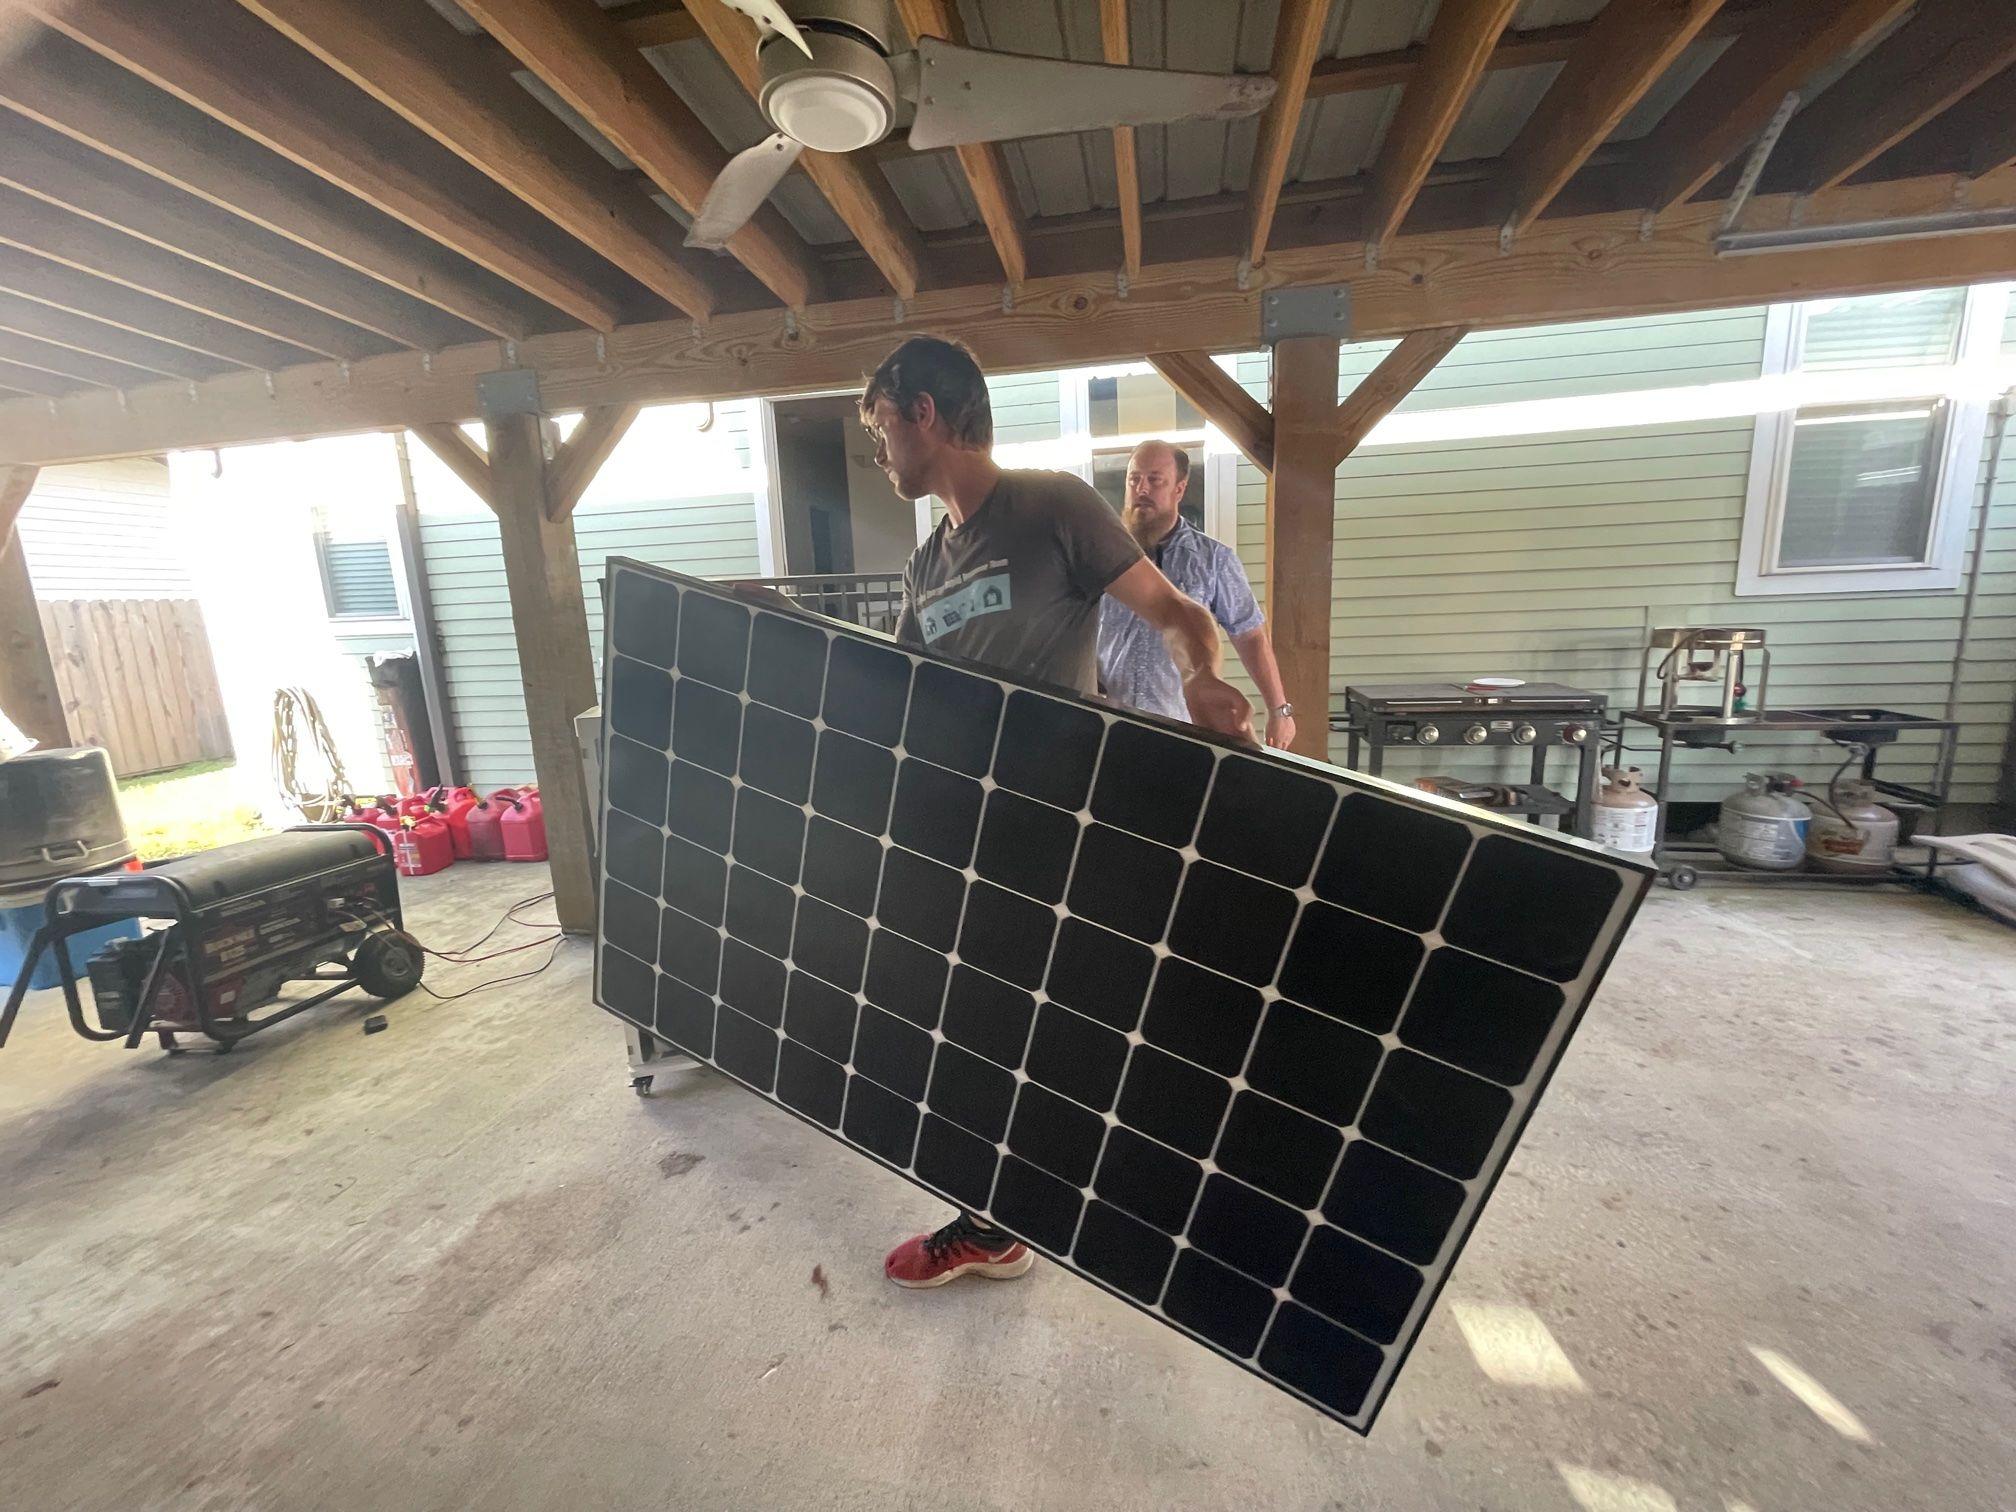 Replacing diesel generator with solar at NOLA VFW